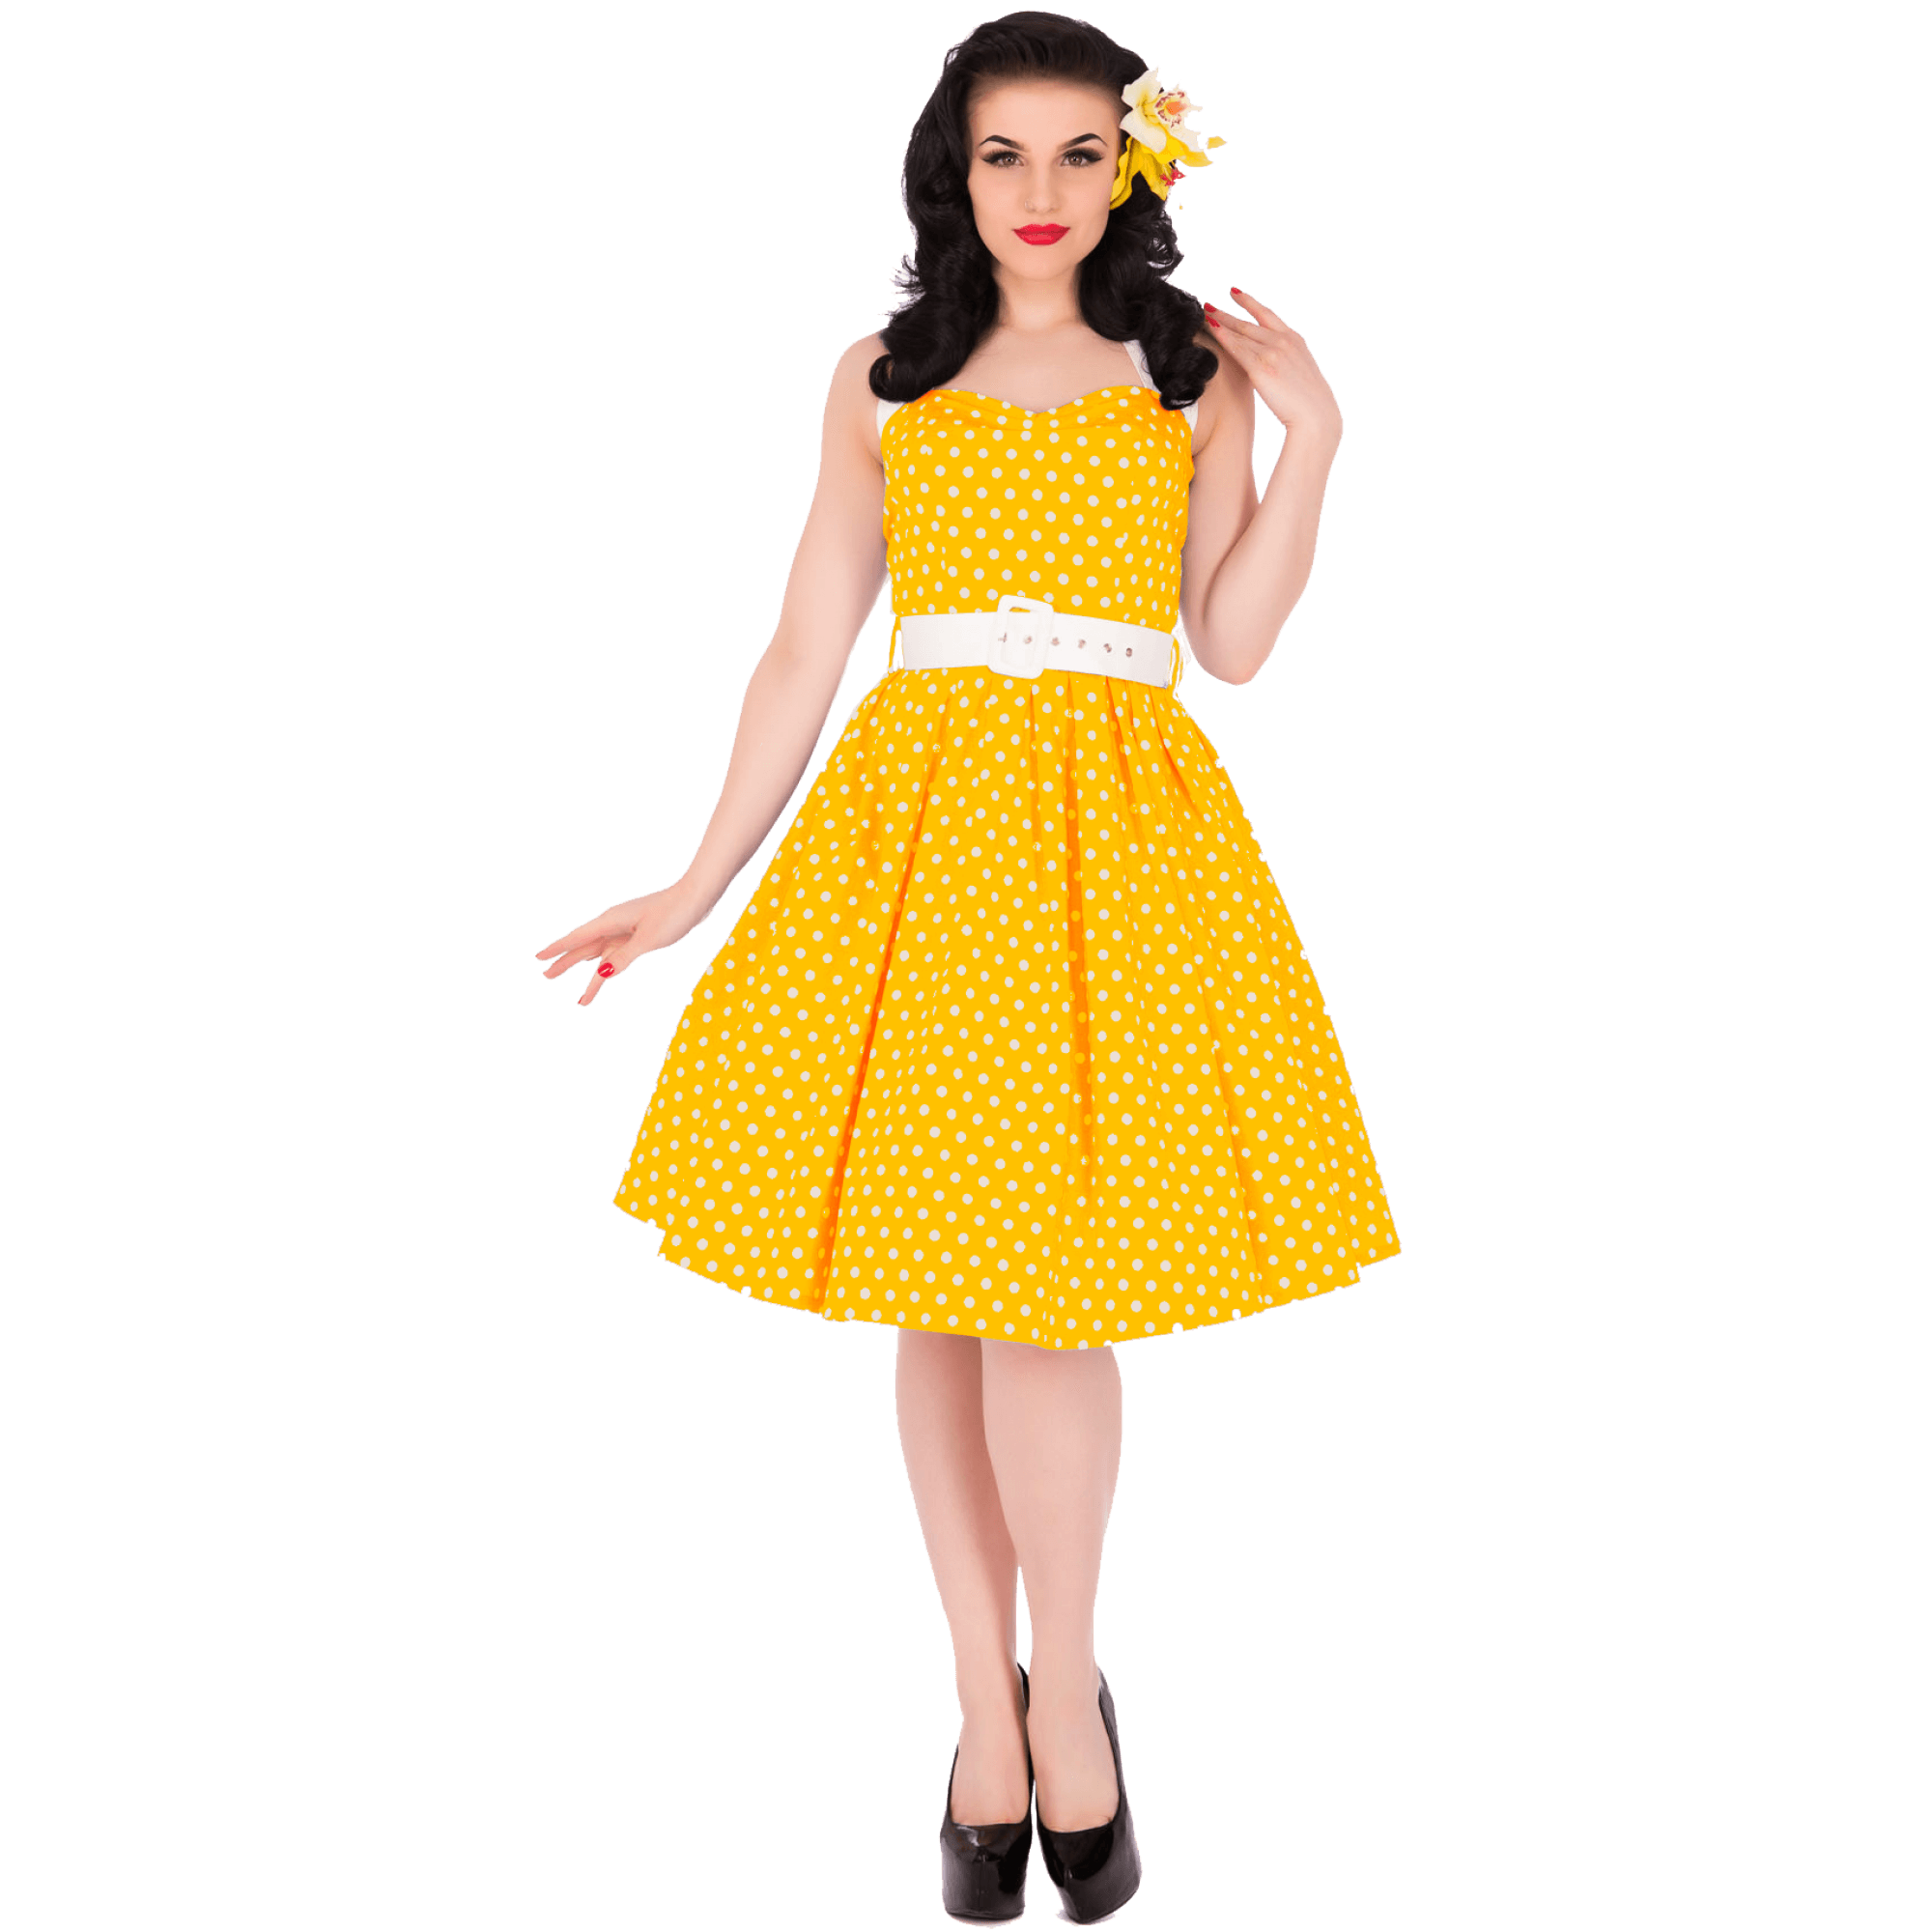 rebelské retro šaty žlté s bodkami